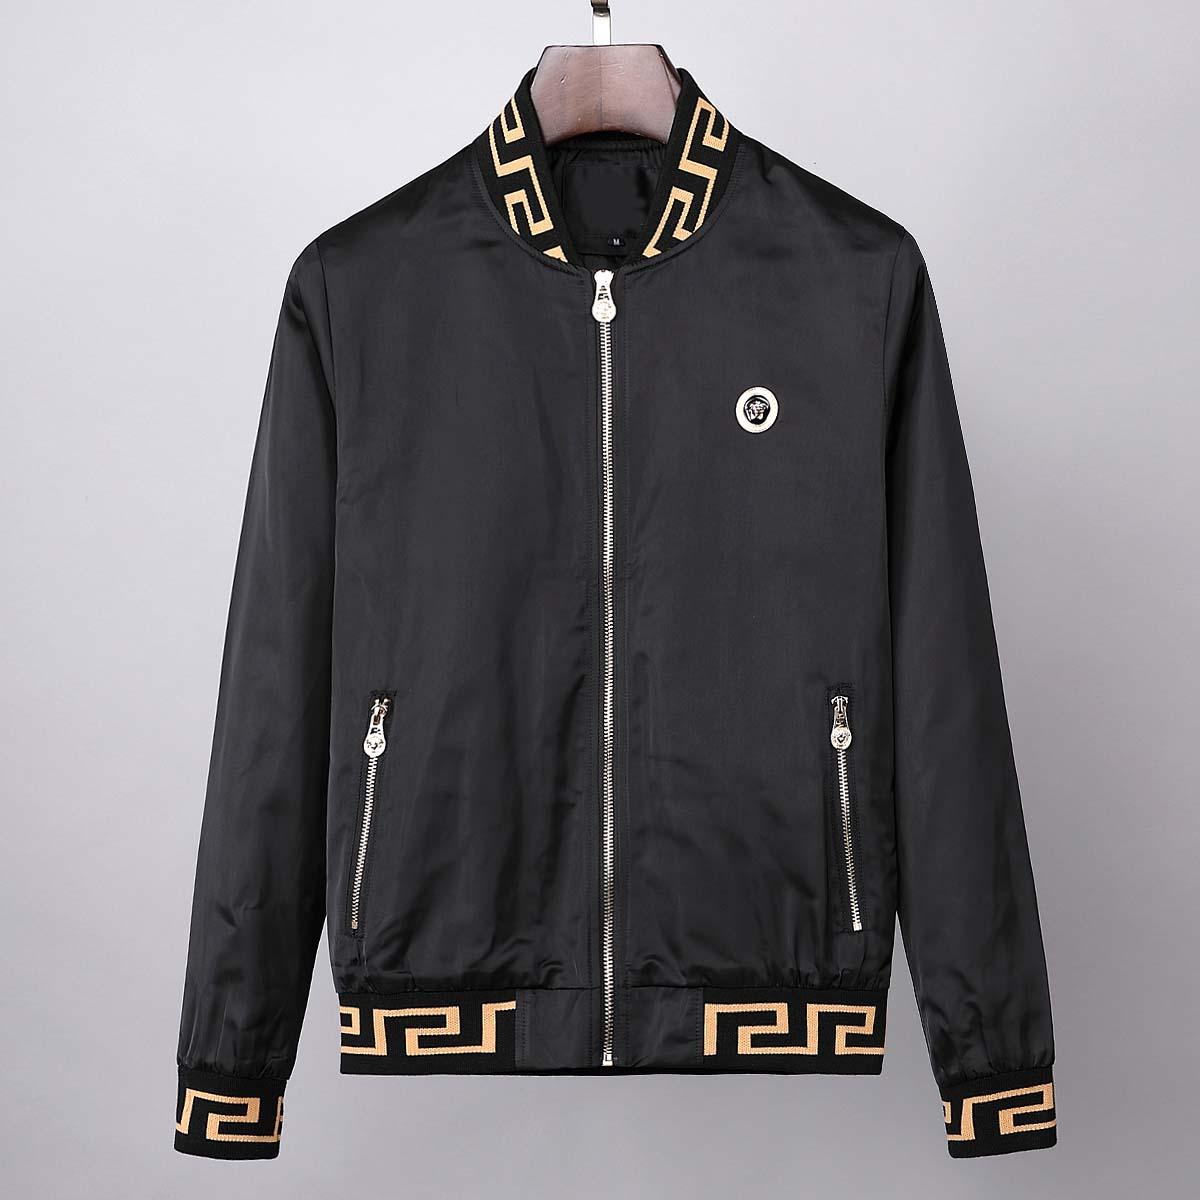 Men Women Designer Jacket Coat Luxury new Sweatshirt Hoodie Long Sleeve Autumn Sports Zipper Windcheater Mens Clothes Plus Size Hoodies 1983